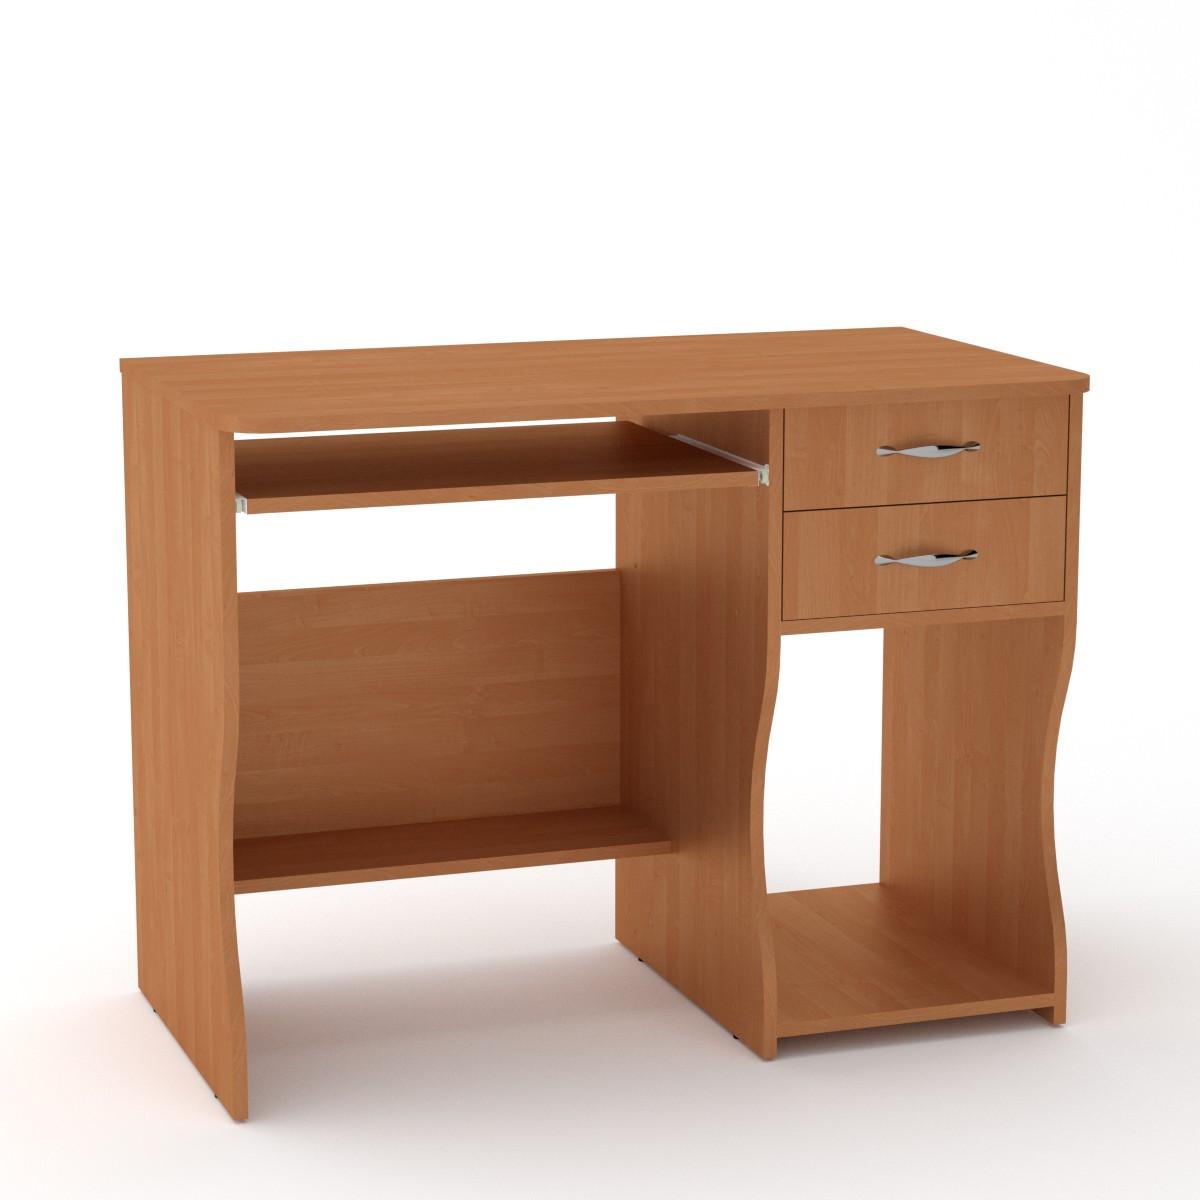 Стол компьютерный СКМ-7 ольха Компанит (100х55х77 см)